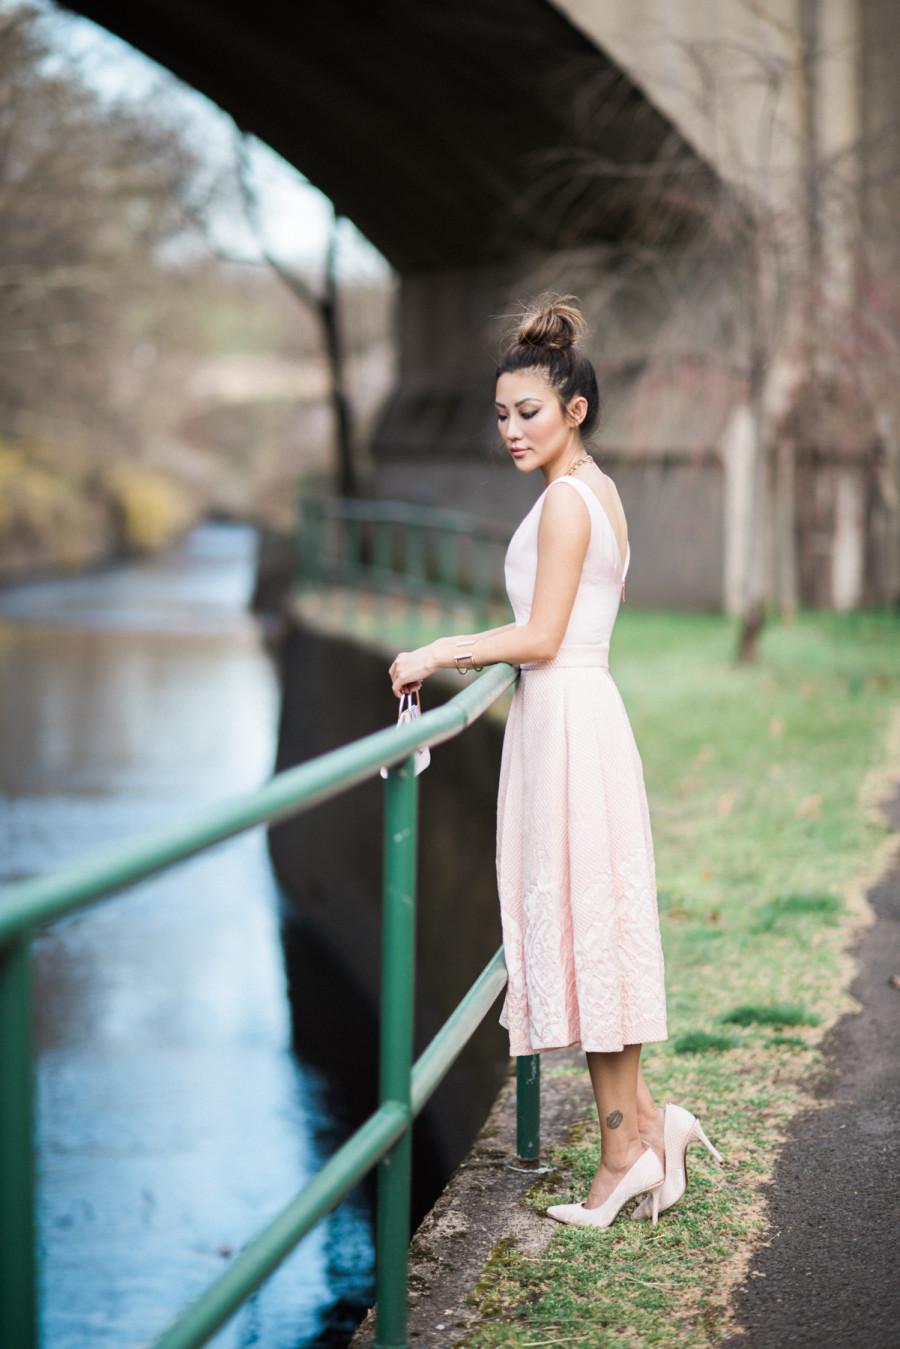 NOTJESSFASHION, NYC, Top Fashion Blogger, Lifestyle Blogger, Travel Blogger